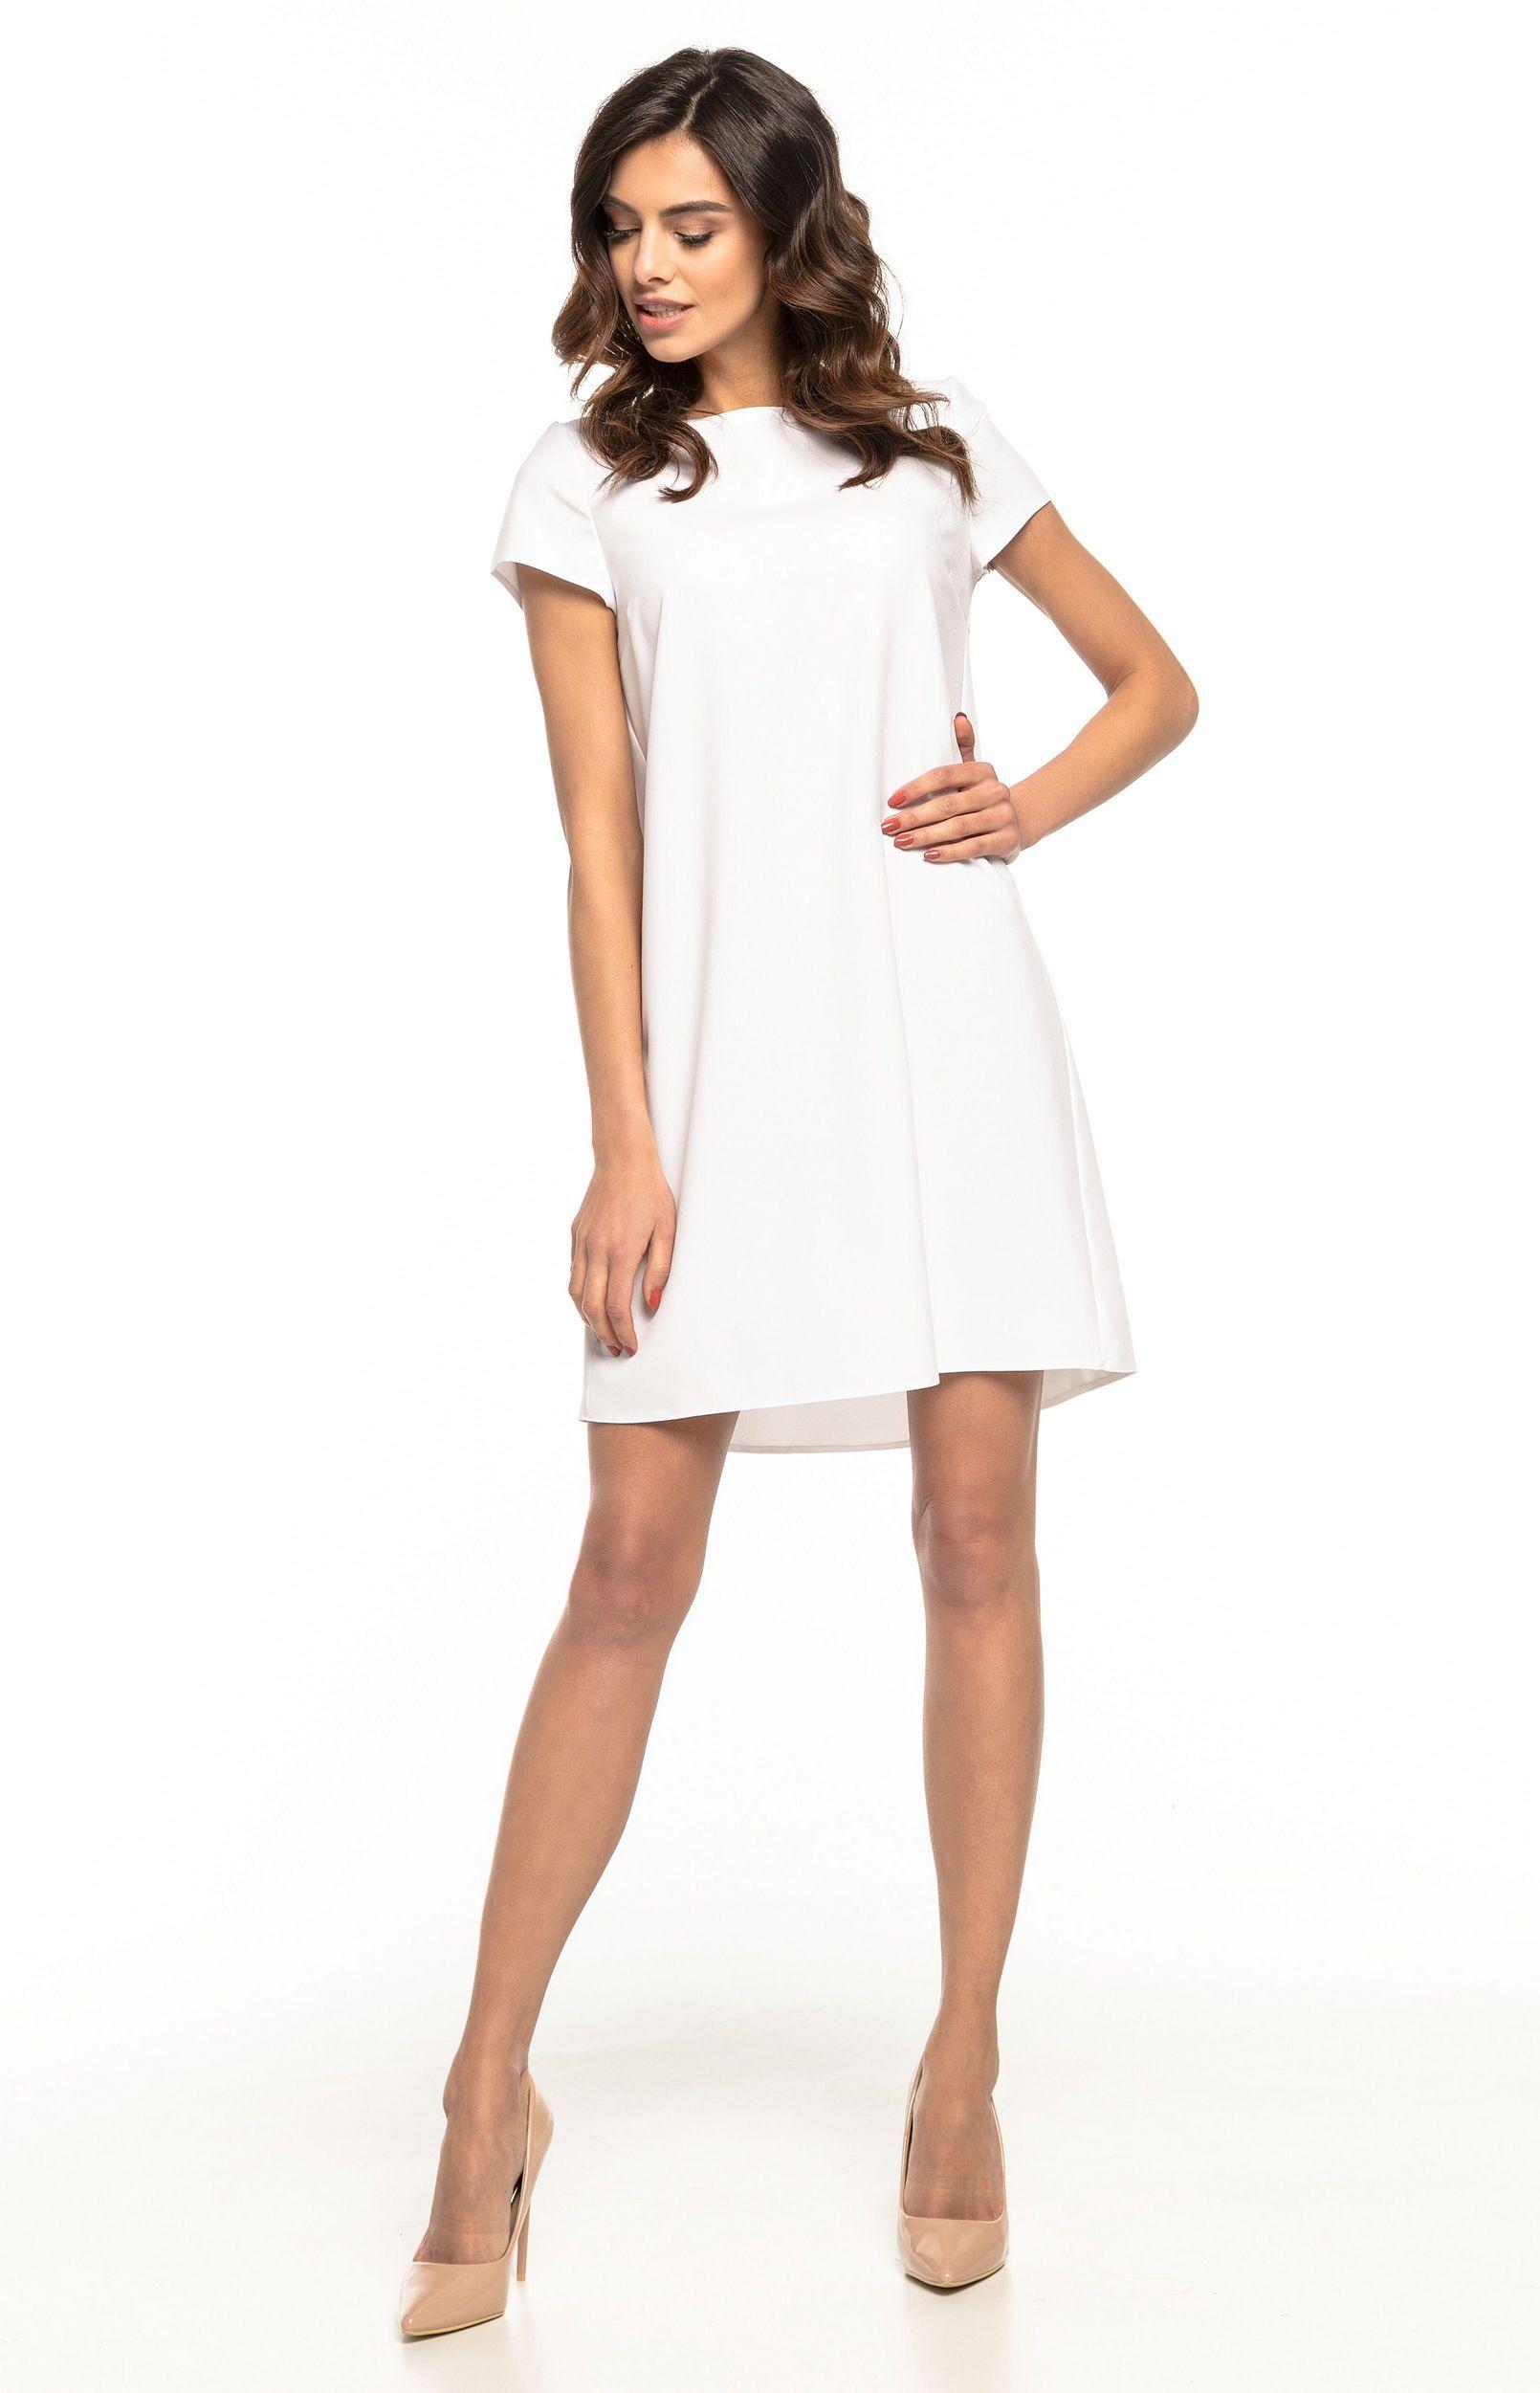 Robe 2019My Courte Blanche En Ample RobeEt Style mNnwv08